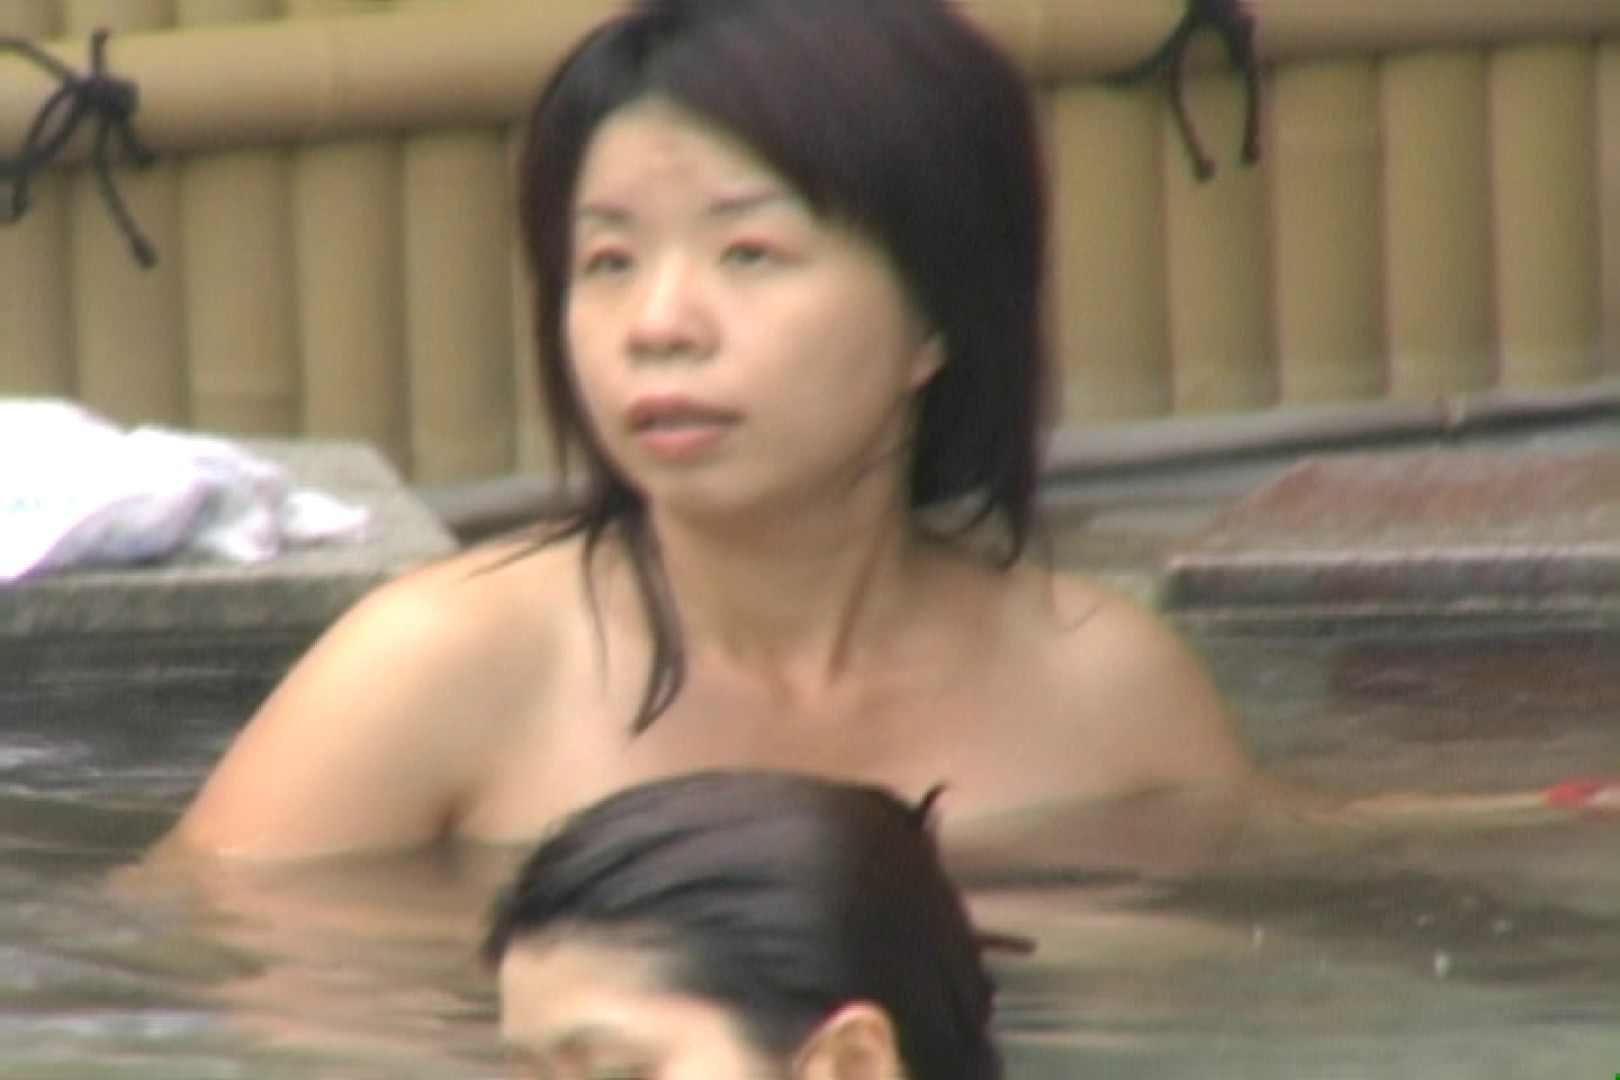 Aquaな露天風呂Vol.621 露天風呂編 | 盗撮シリーズ  106PIX 35